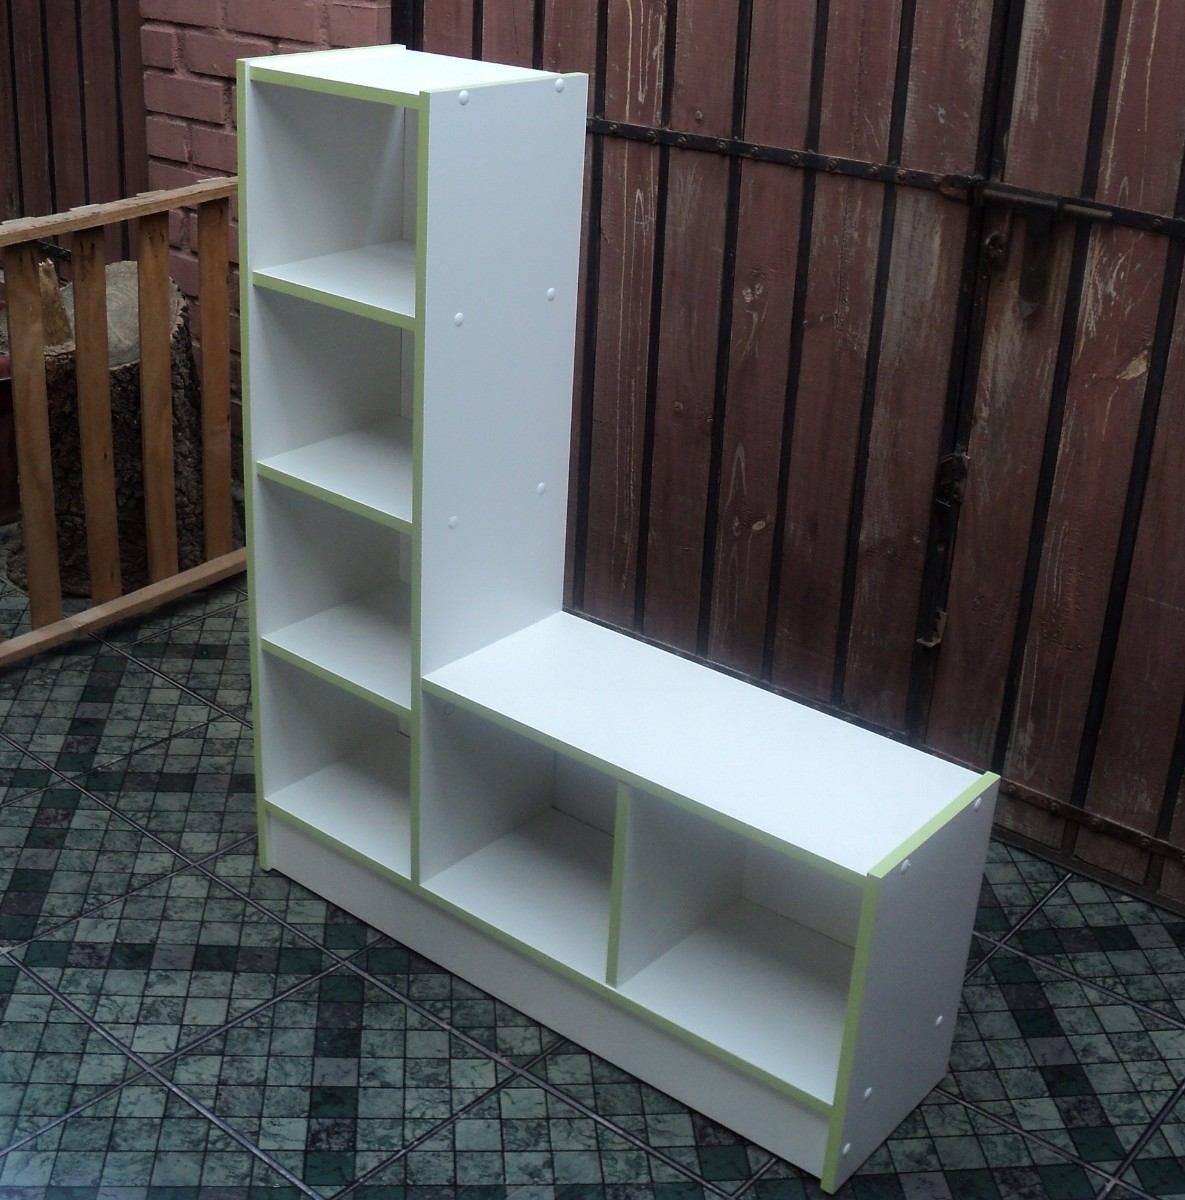 Mueble Multiuso En Melamina Blanca 105 X 90 X 25 26